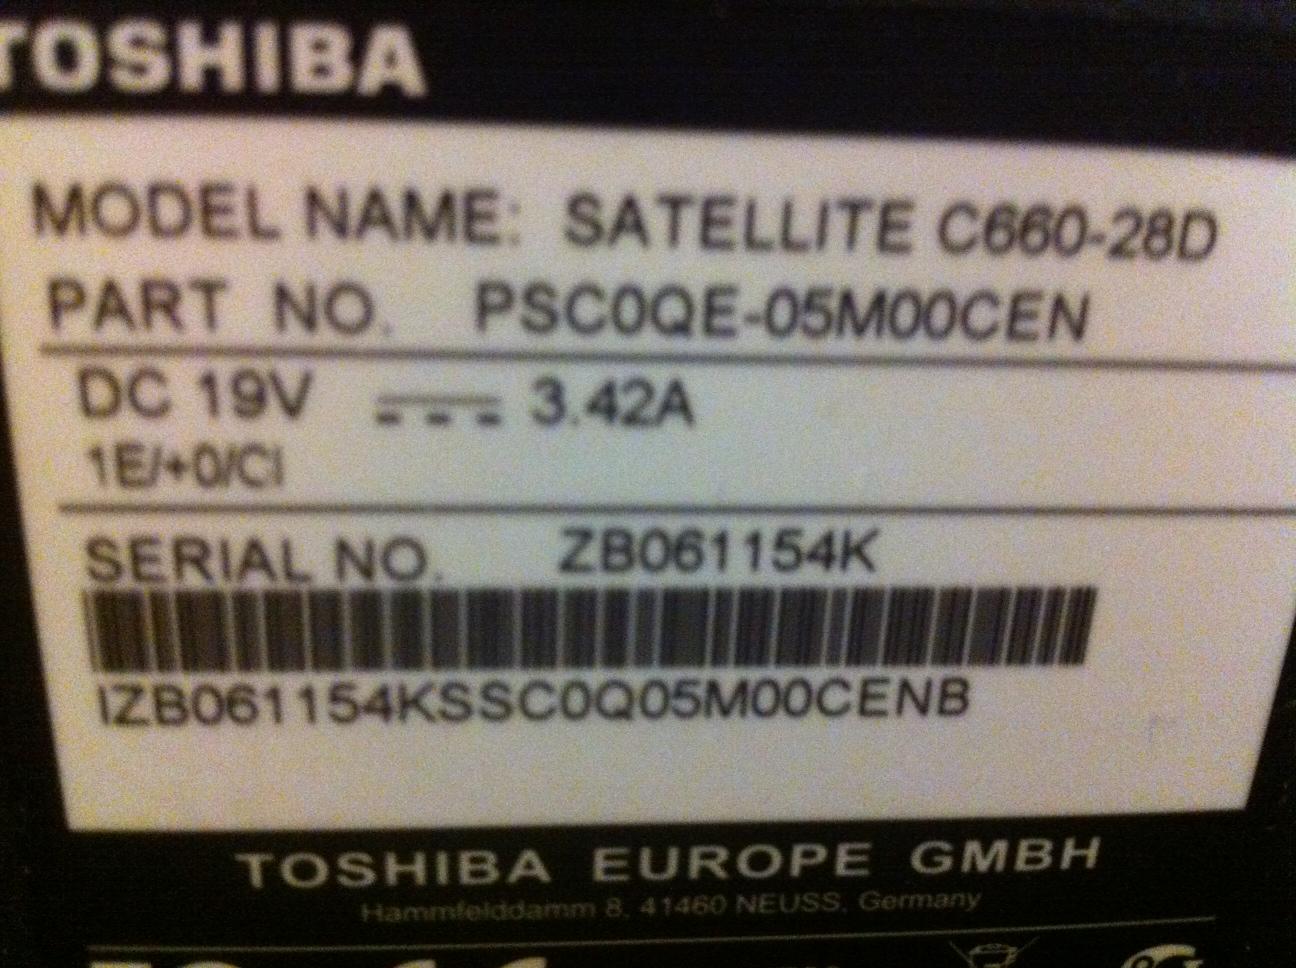 Toshiba satellite c660 drivers for windows 7 32 bit